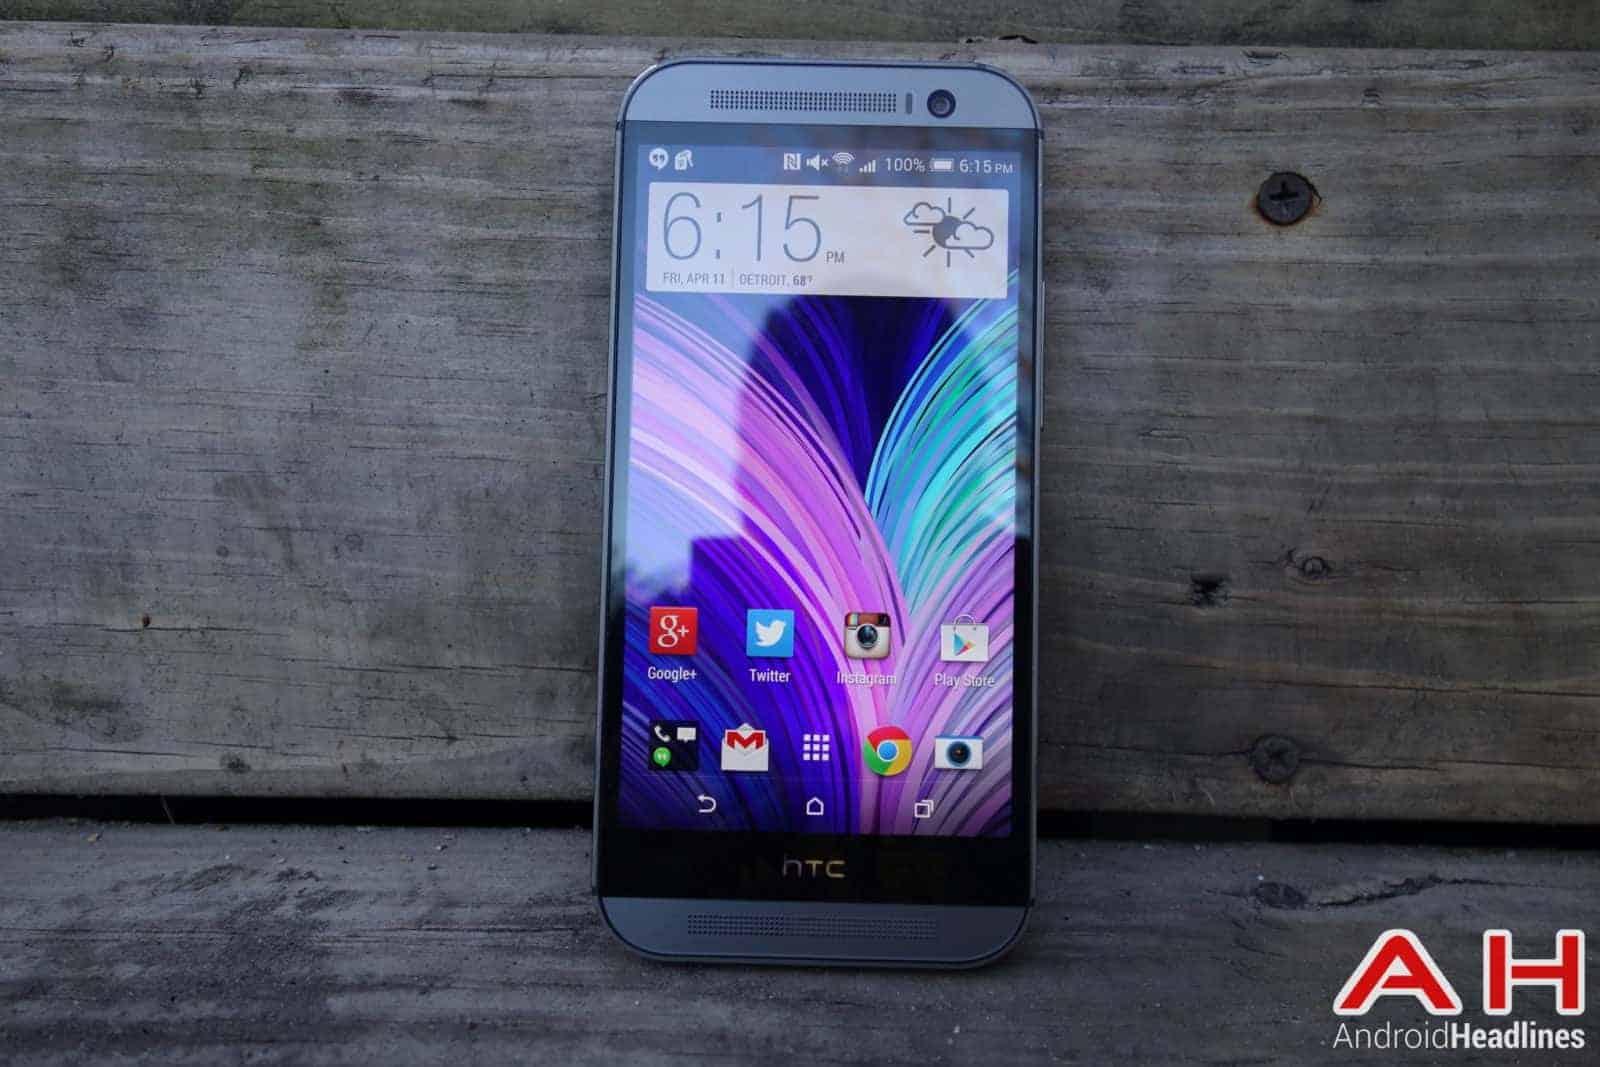 HTC-One-M8 (27)